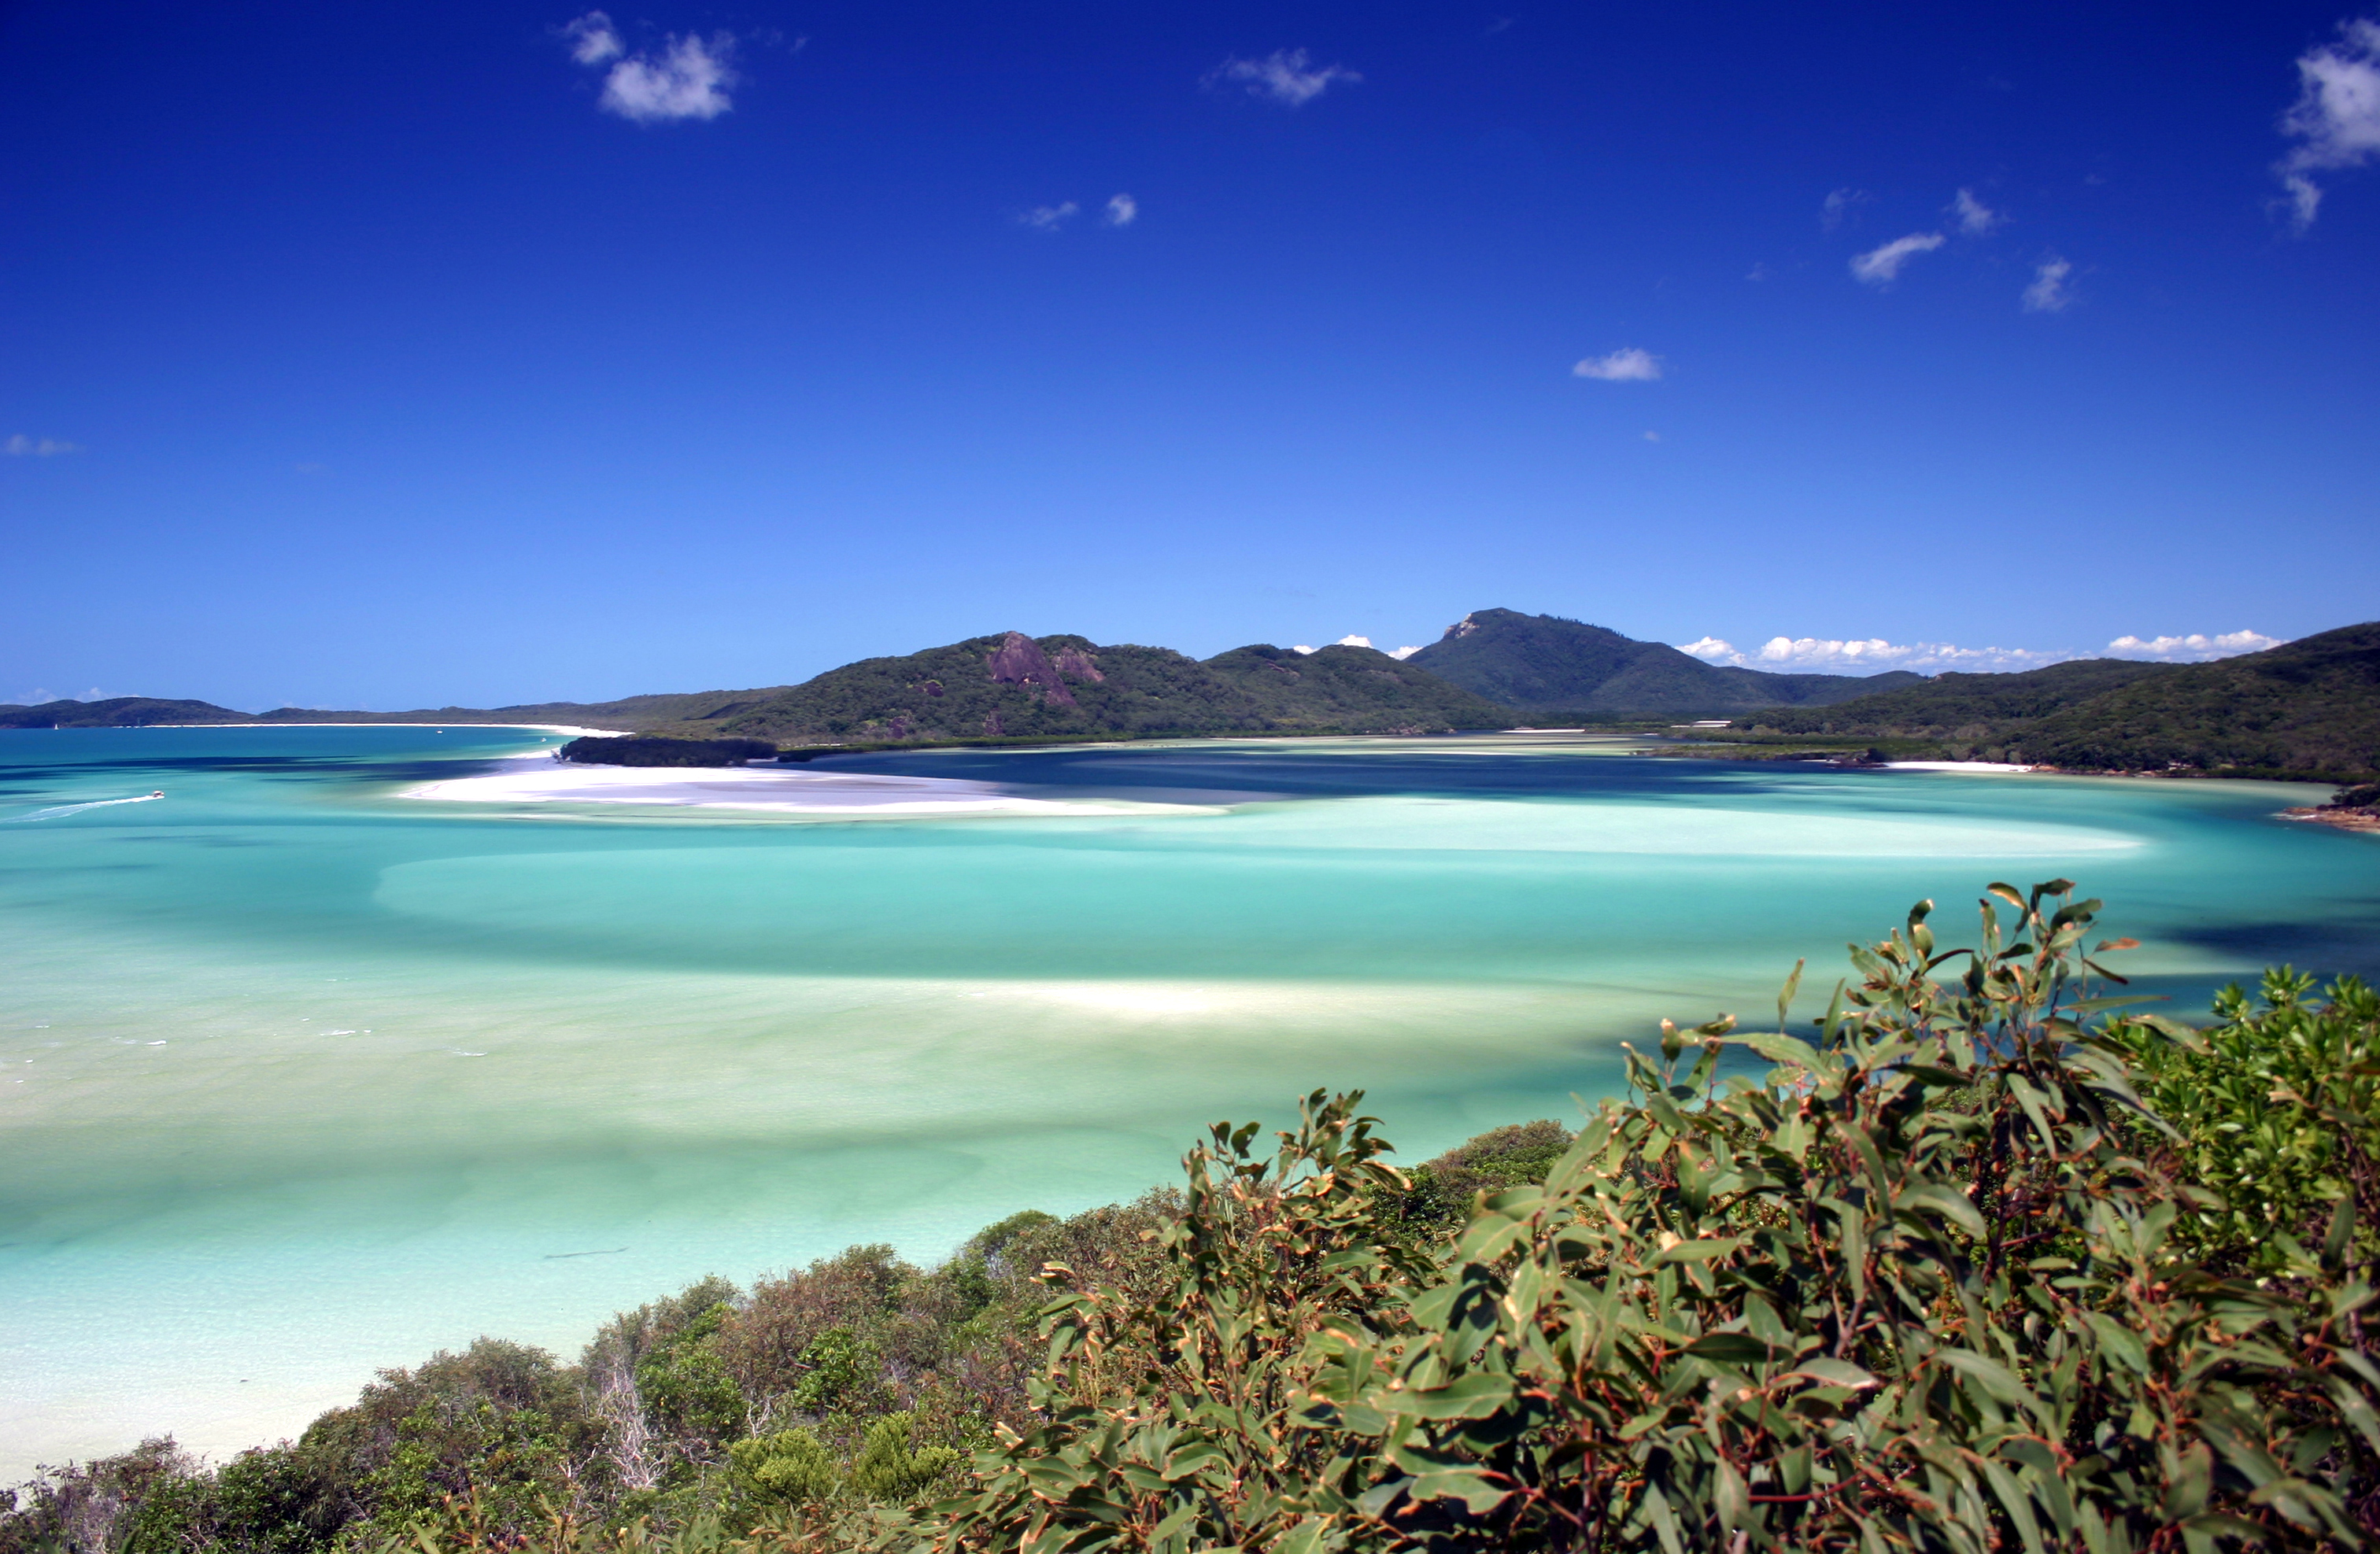 Whitsunday_Island_-_Whitehaven_Beach_05